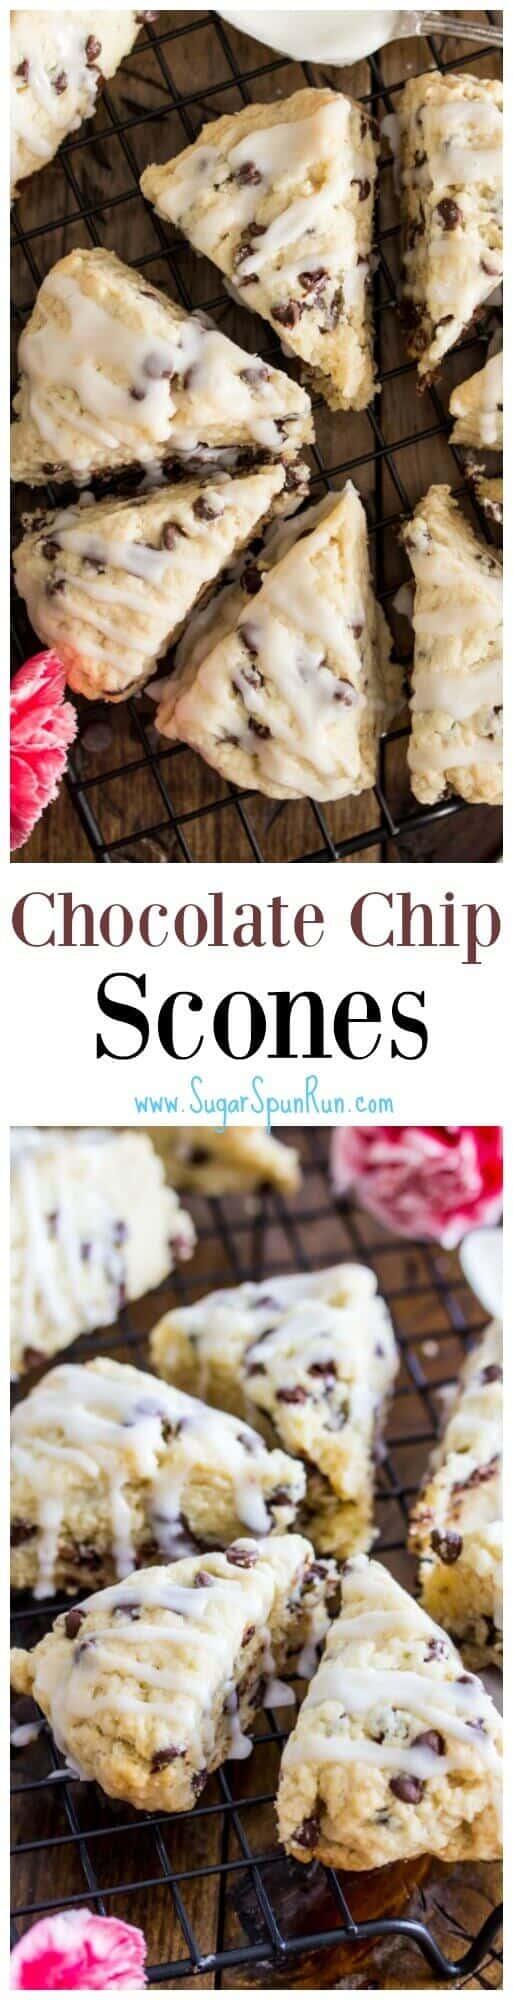 Mini Chocolate Chip Scones -- these are so good! || Sugar Spun Run